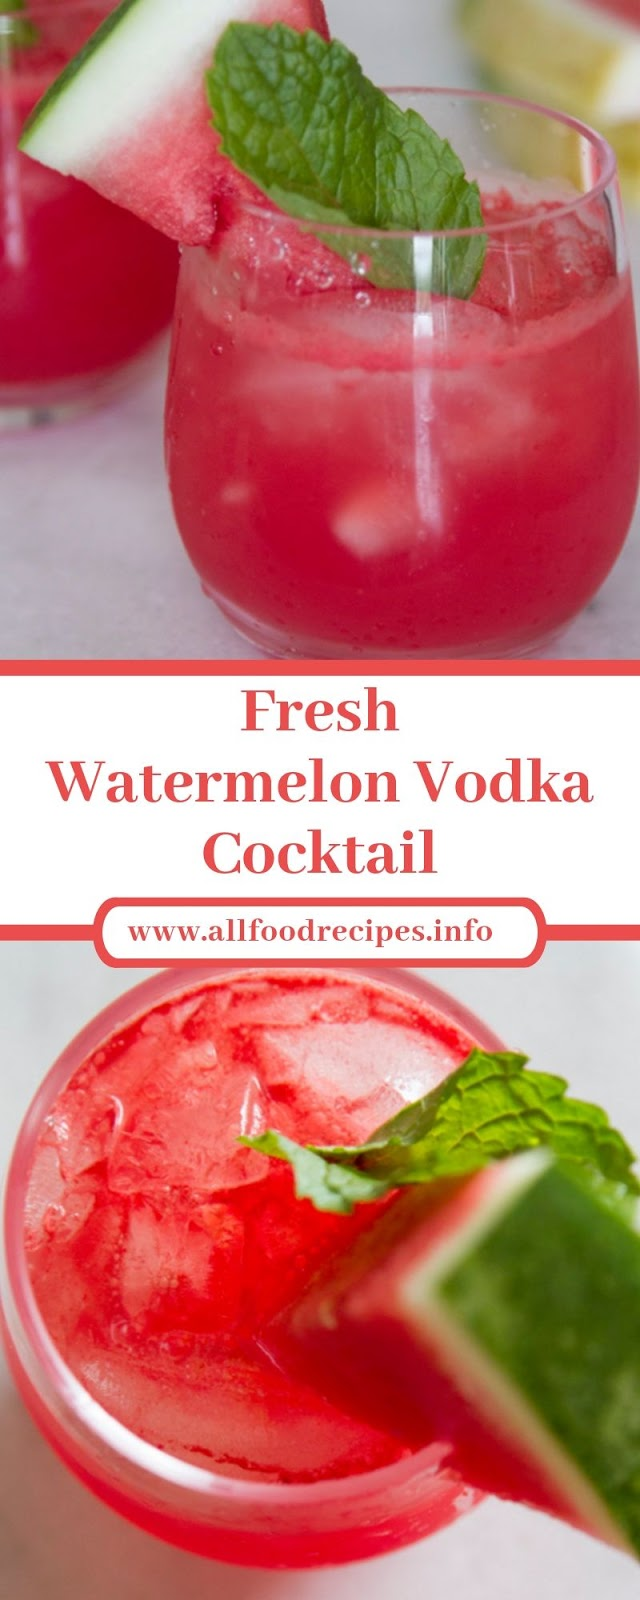 Fresh Watermelon Vodka Cocktail